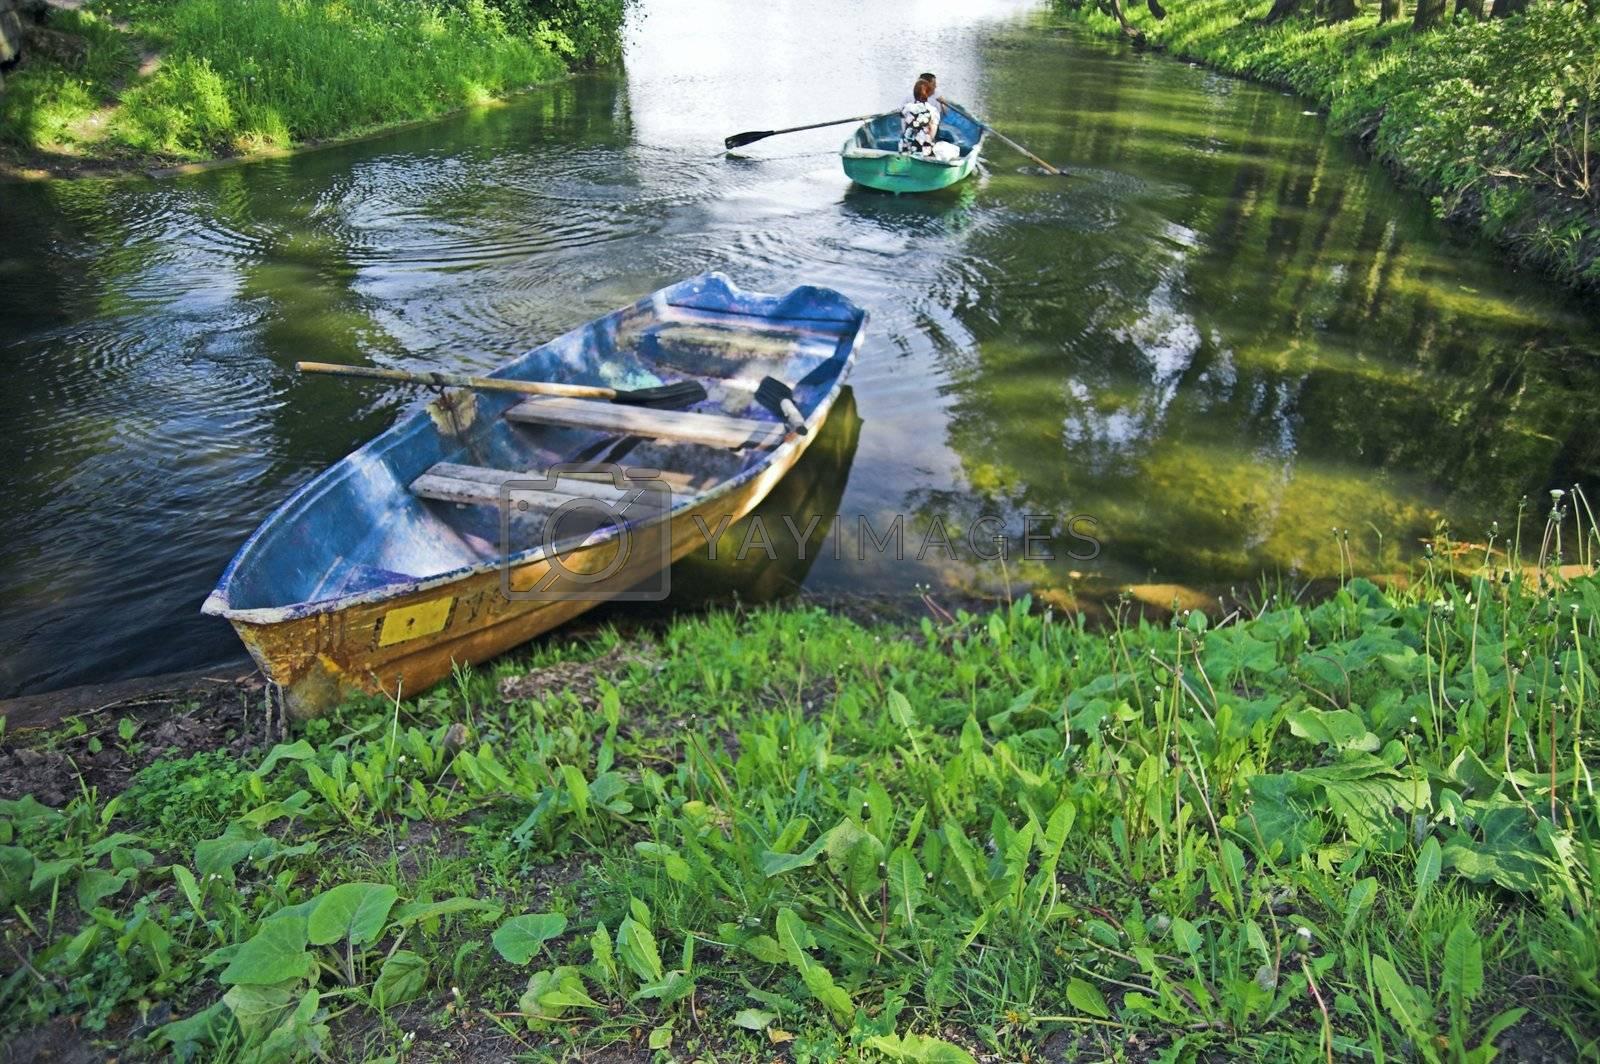 Boat at lake shore in summer park in Saint Petersburg, Russia